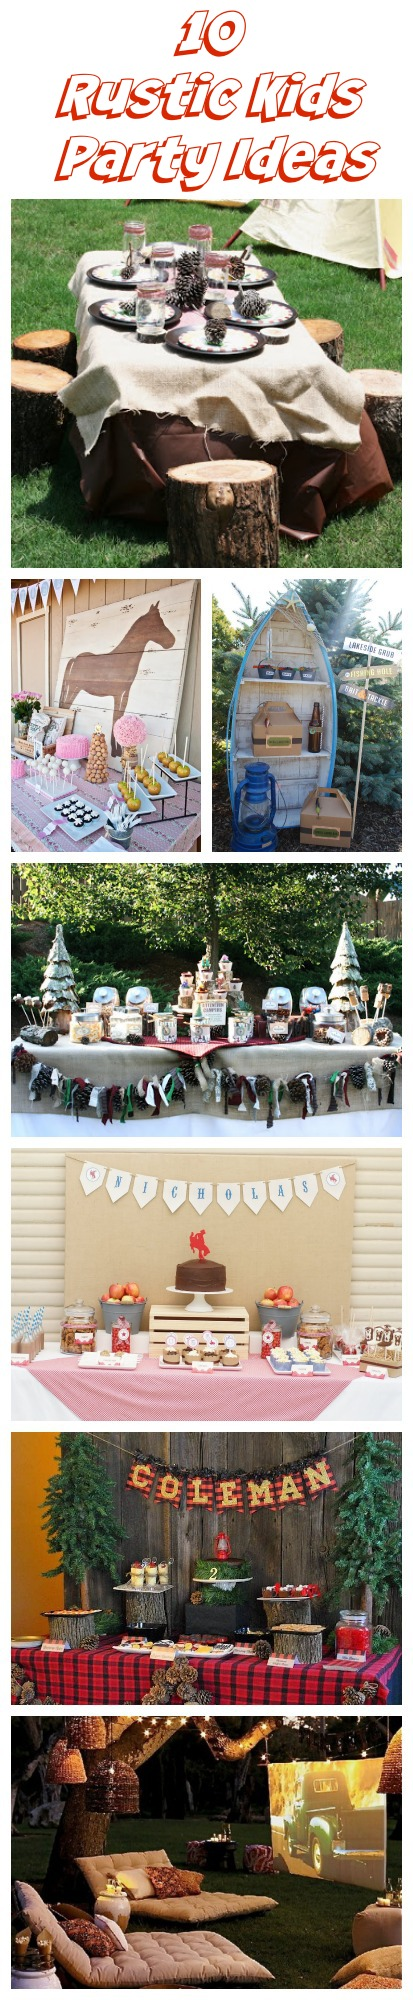 Rustic Kids Birthday Party Ideas